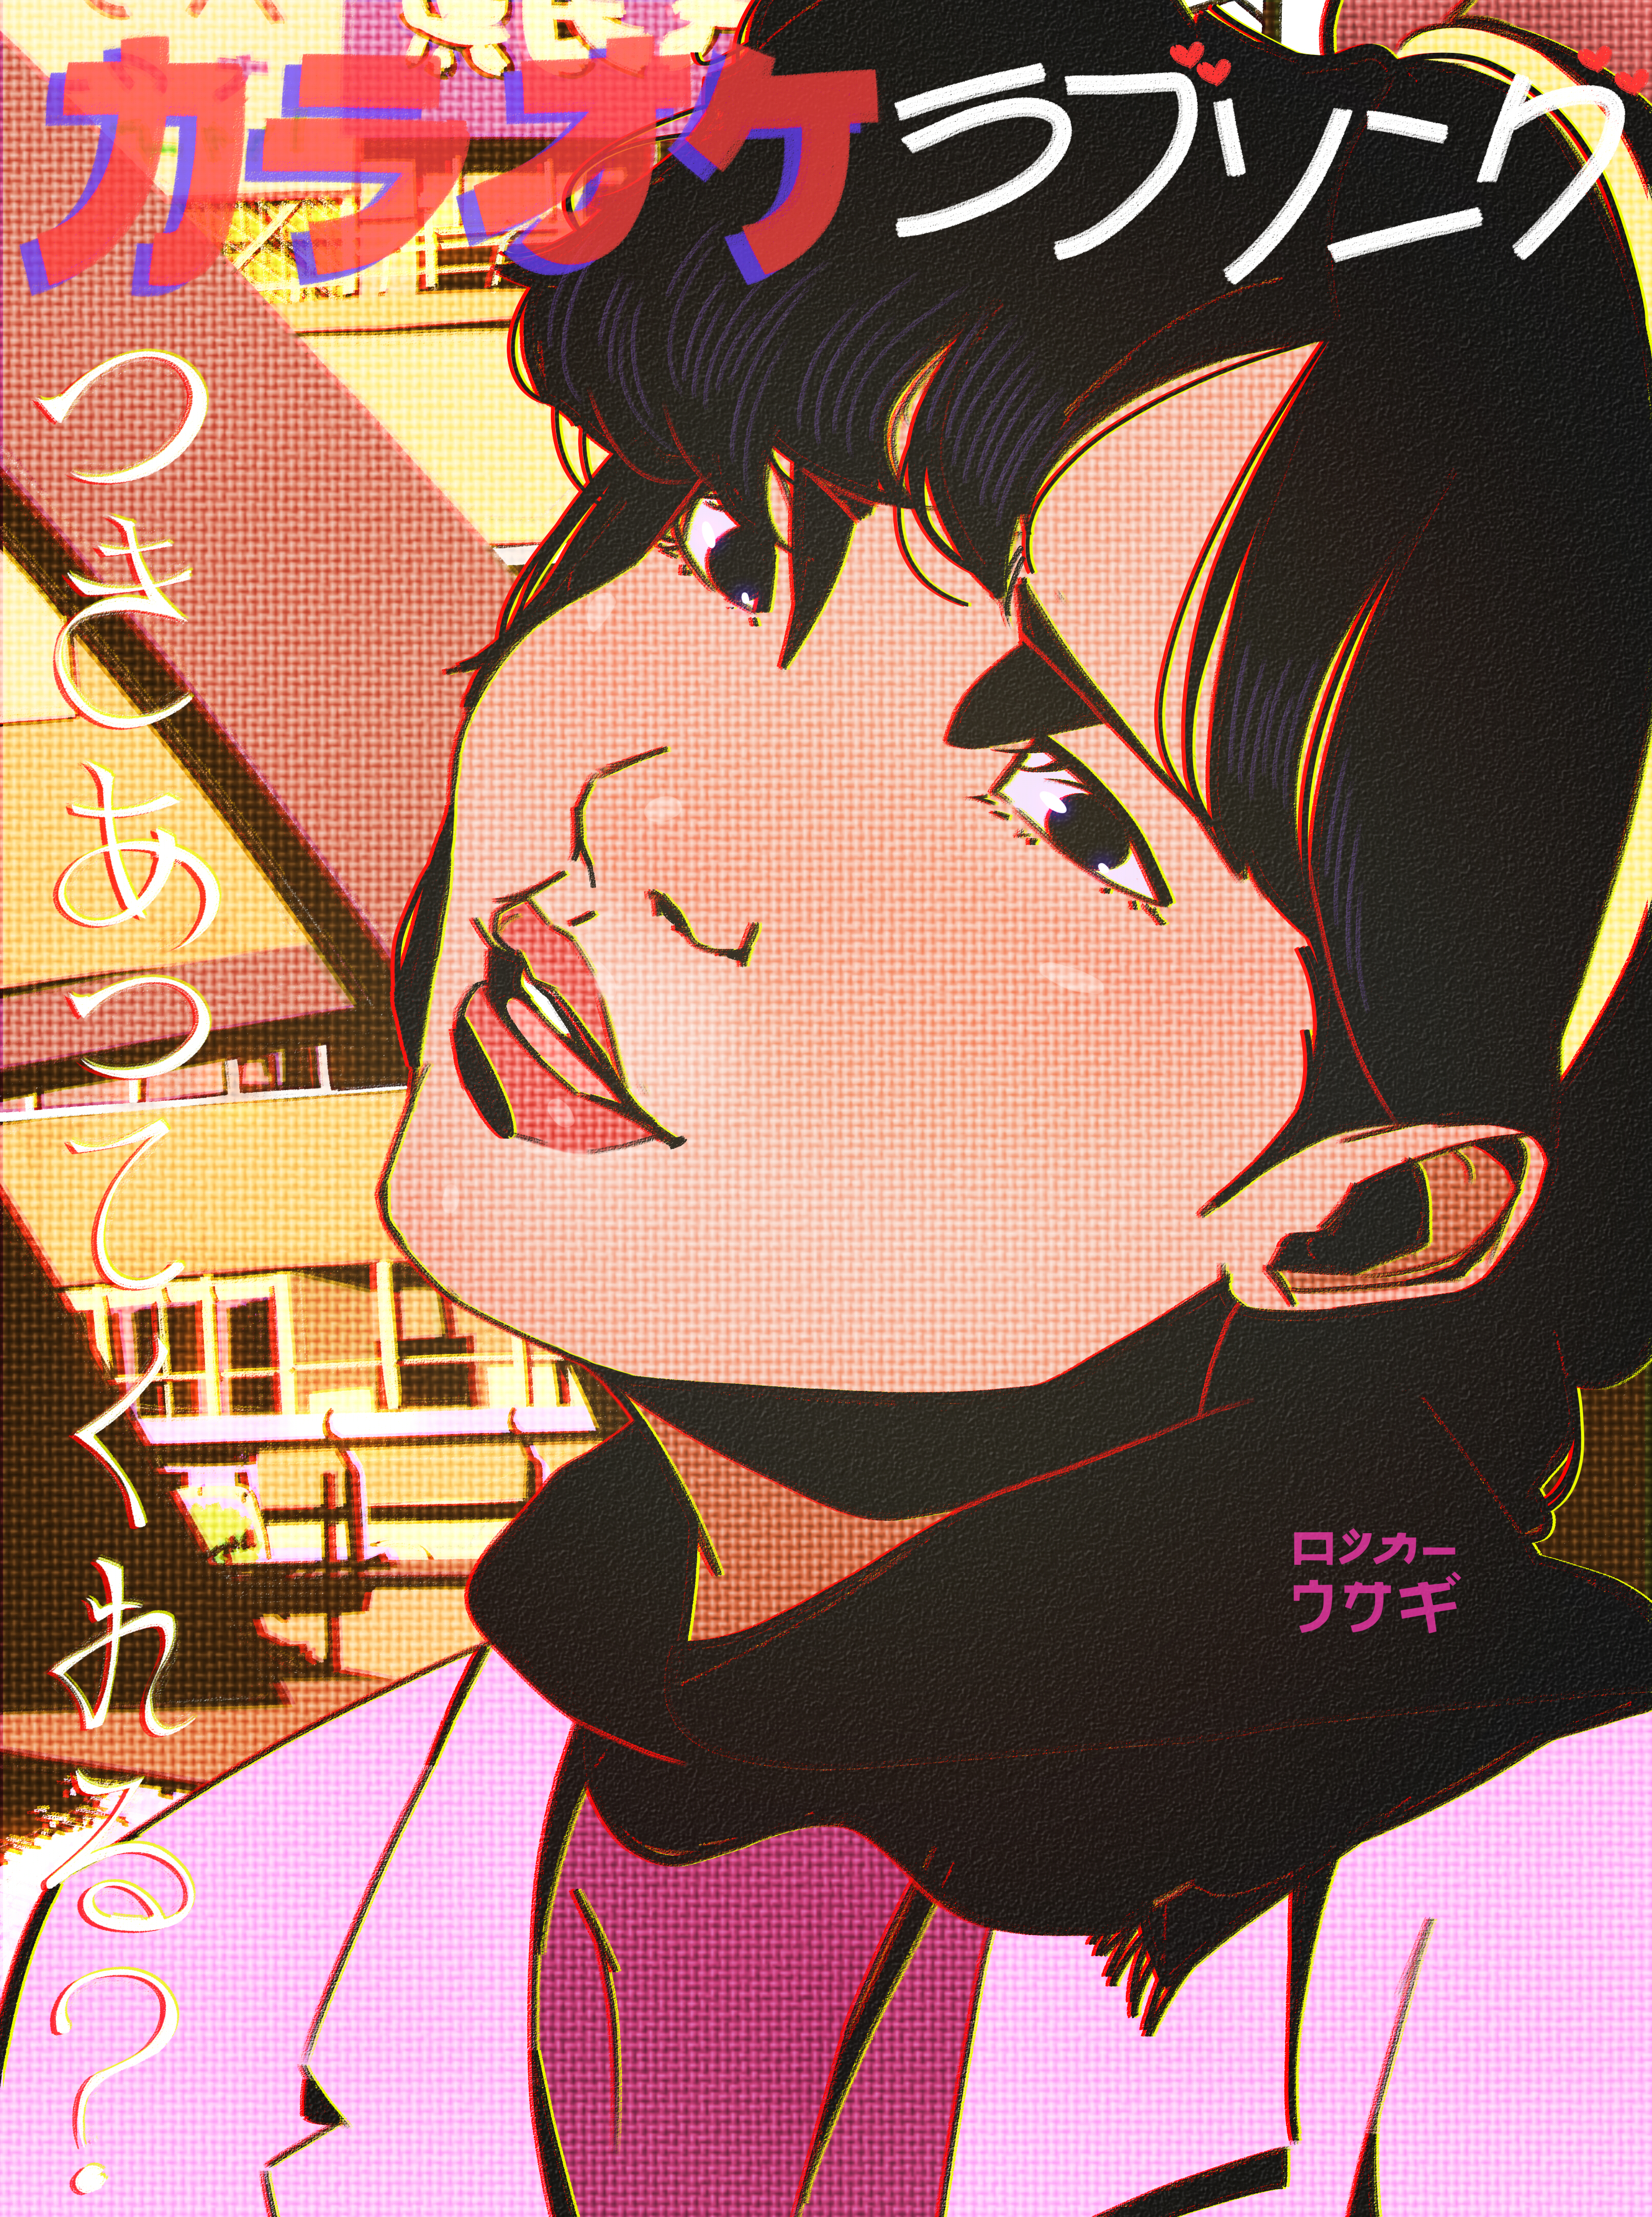 Karaoke love song <3